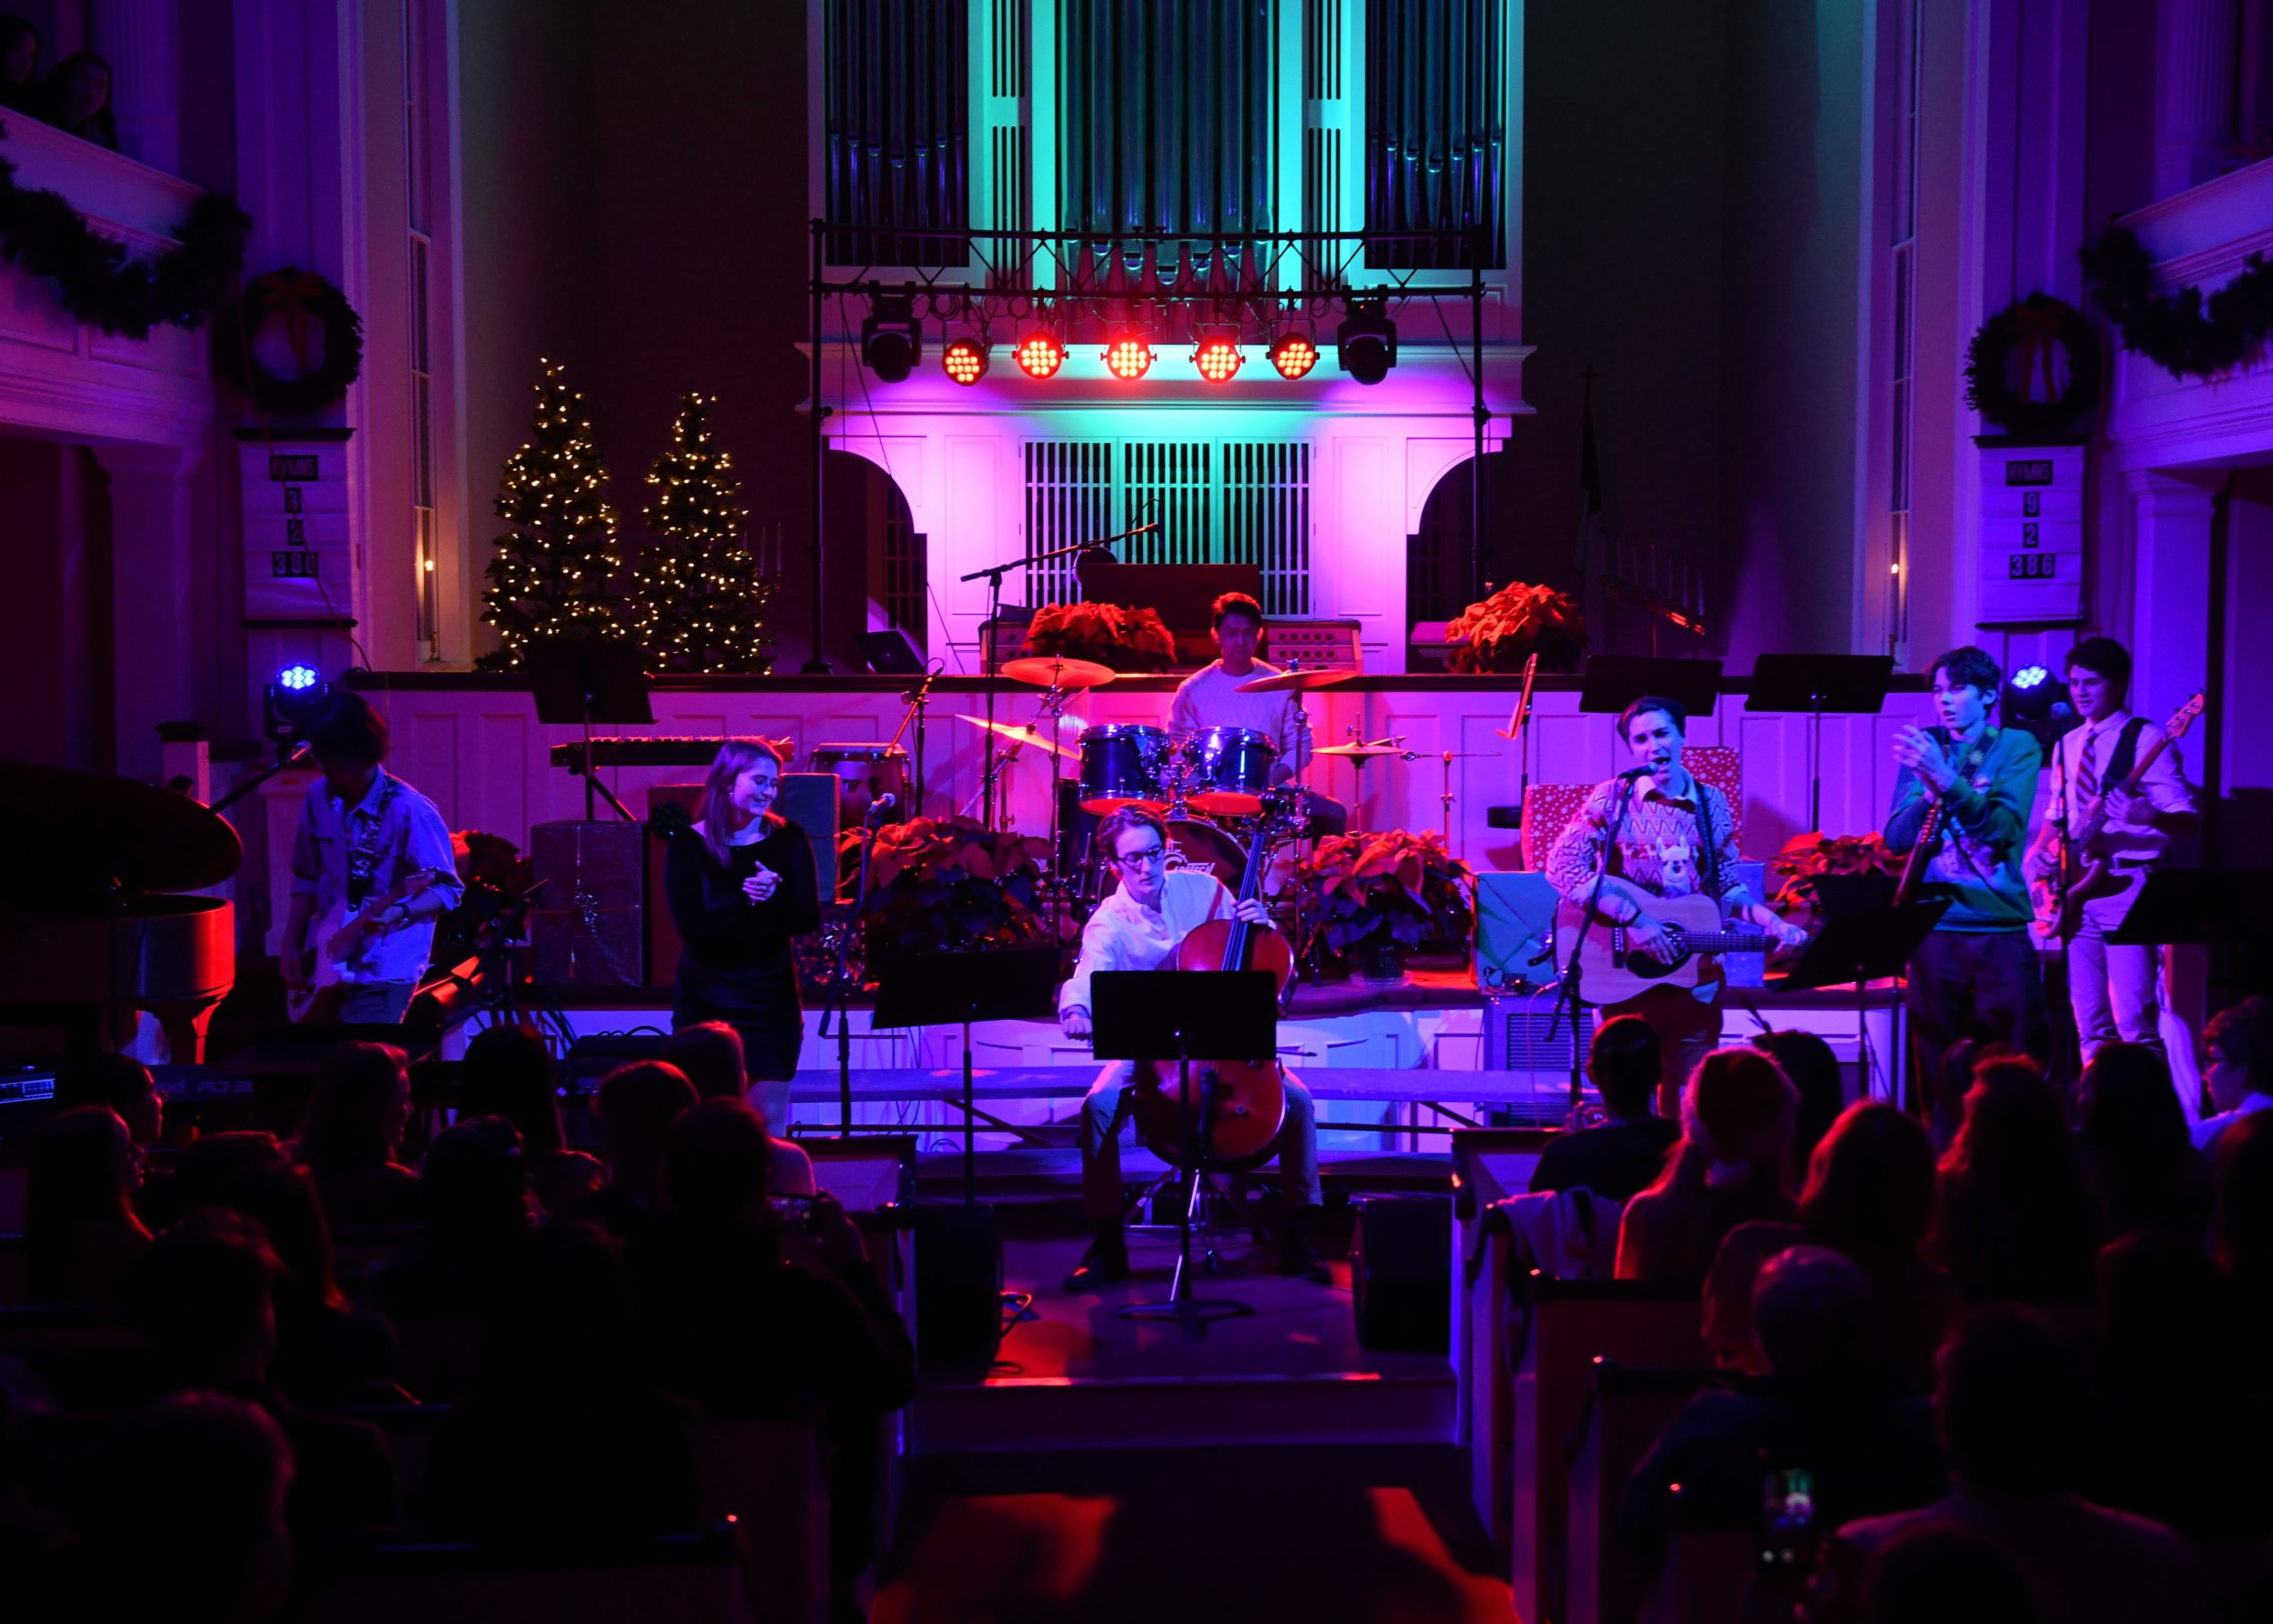 Gunnery Annual Concert